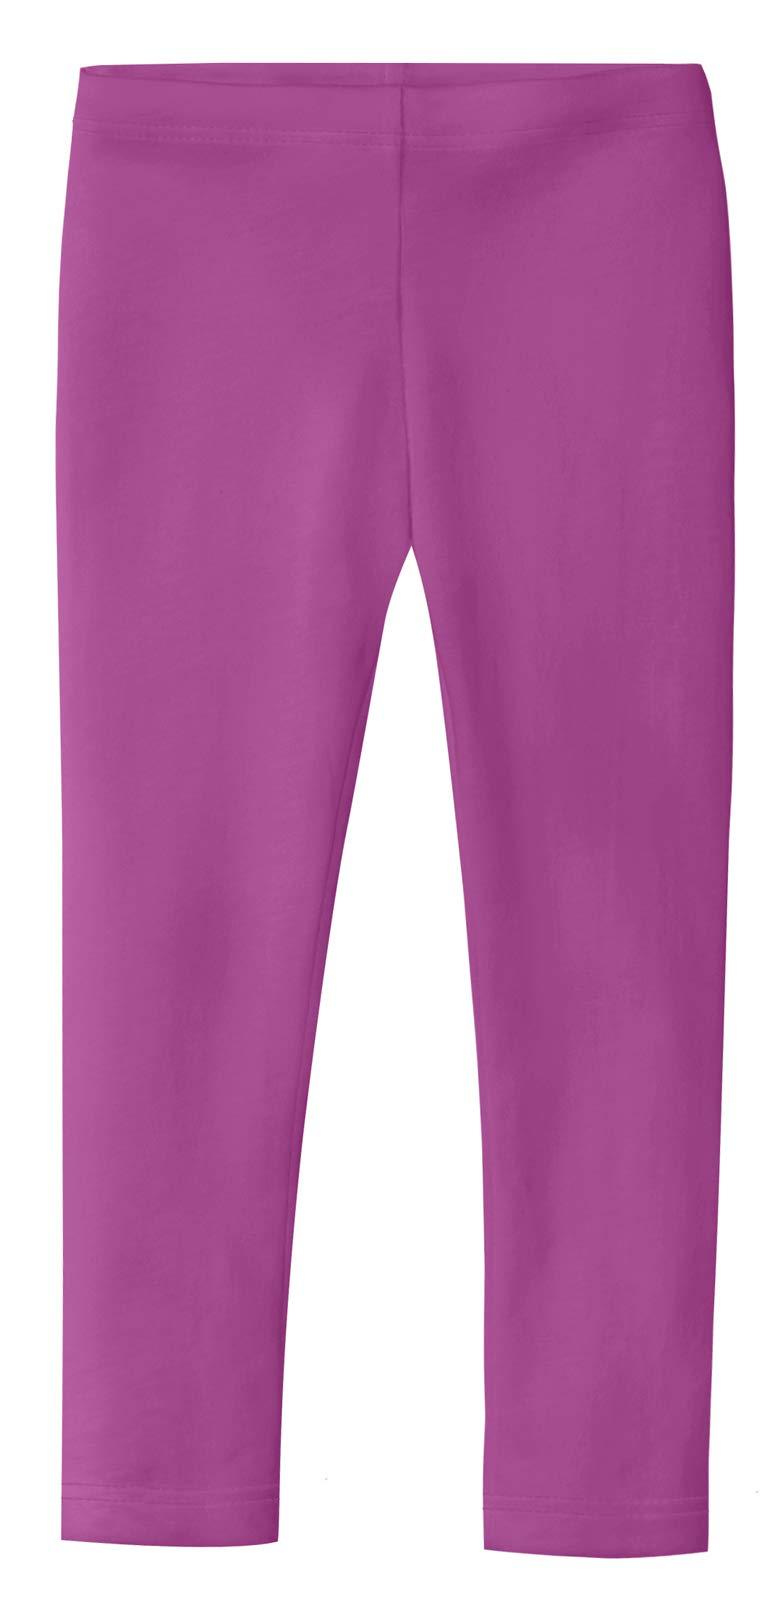 City Threads Girls' Leggings 100% Cotton for School Uniform Sports Coverage Play Perfect for Sensitive Skin SPD Sensory Friendly Clothing,Plum, 5